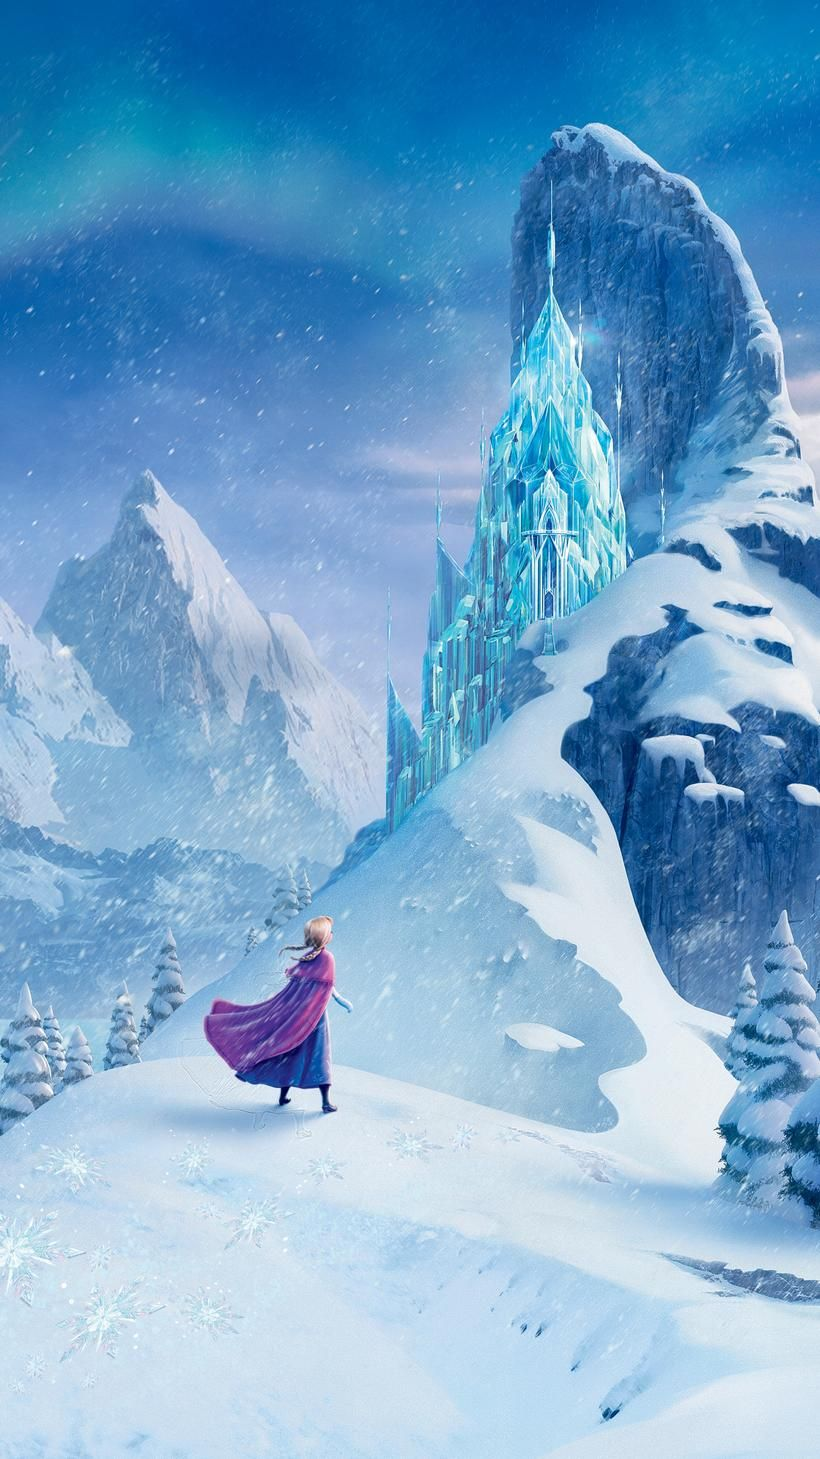 Tangled (2010) Phone Wallpaper Frozen movie, Frozen